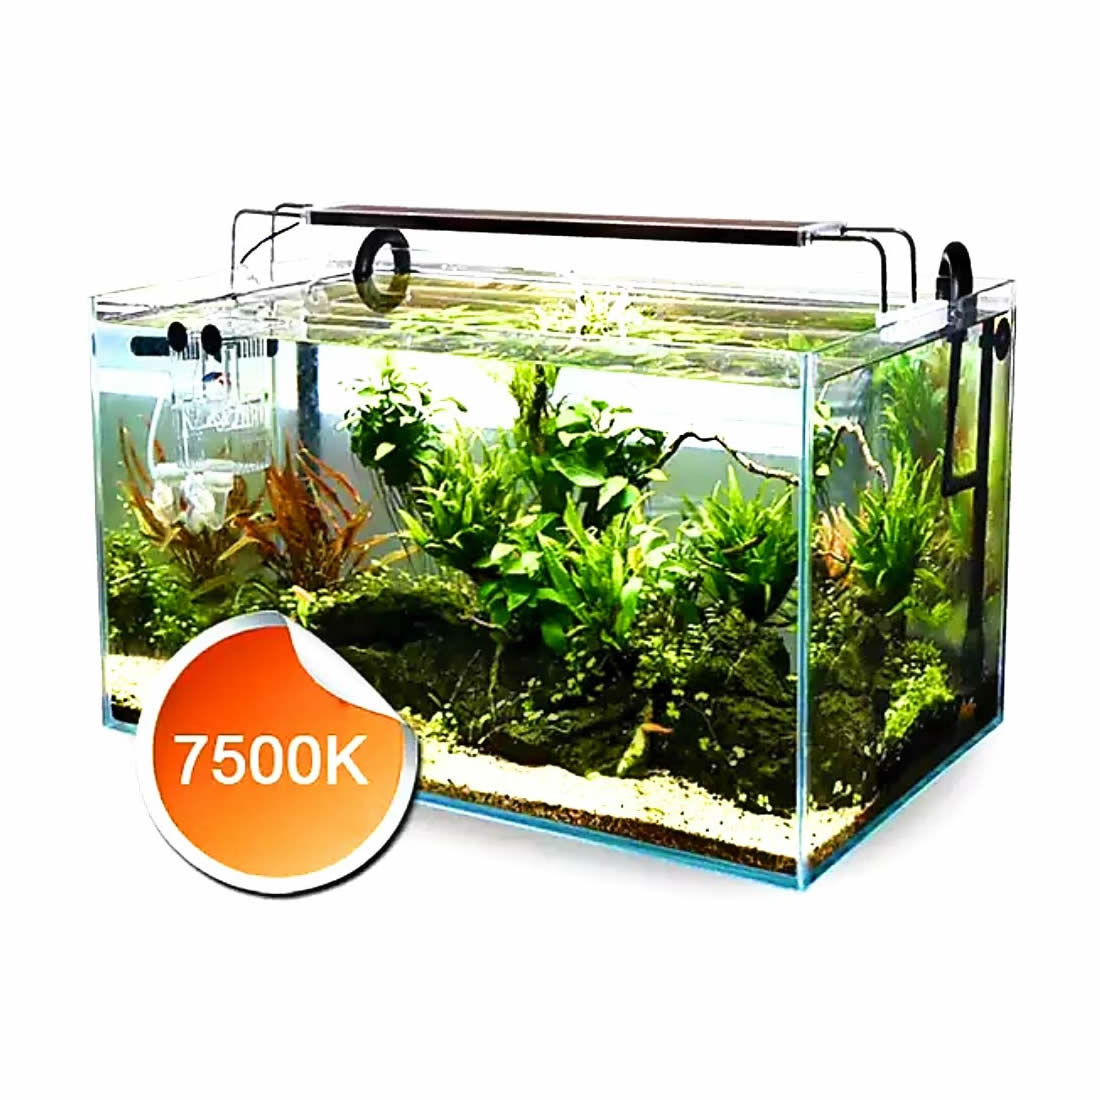 SunSun ADS-700C Aquarium LED Light 45w perfect for 2.5 Feet FreshWater Tank